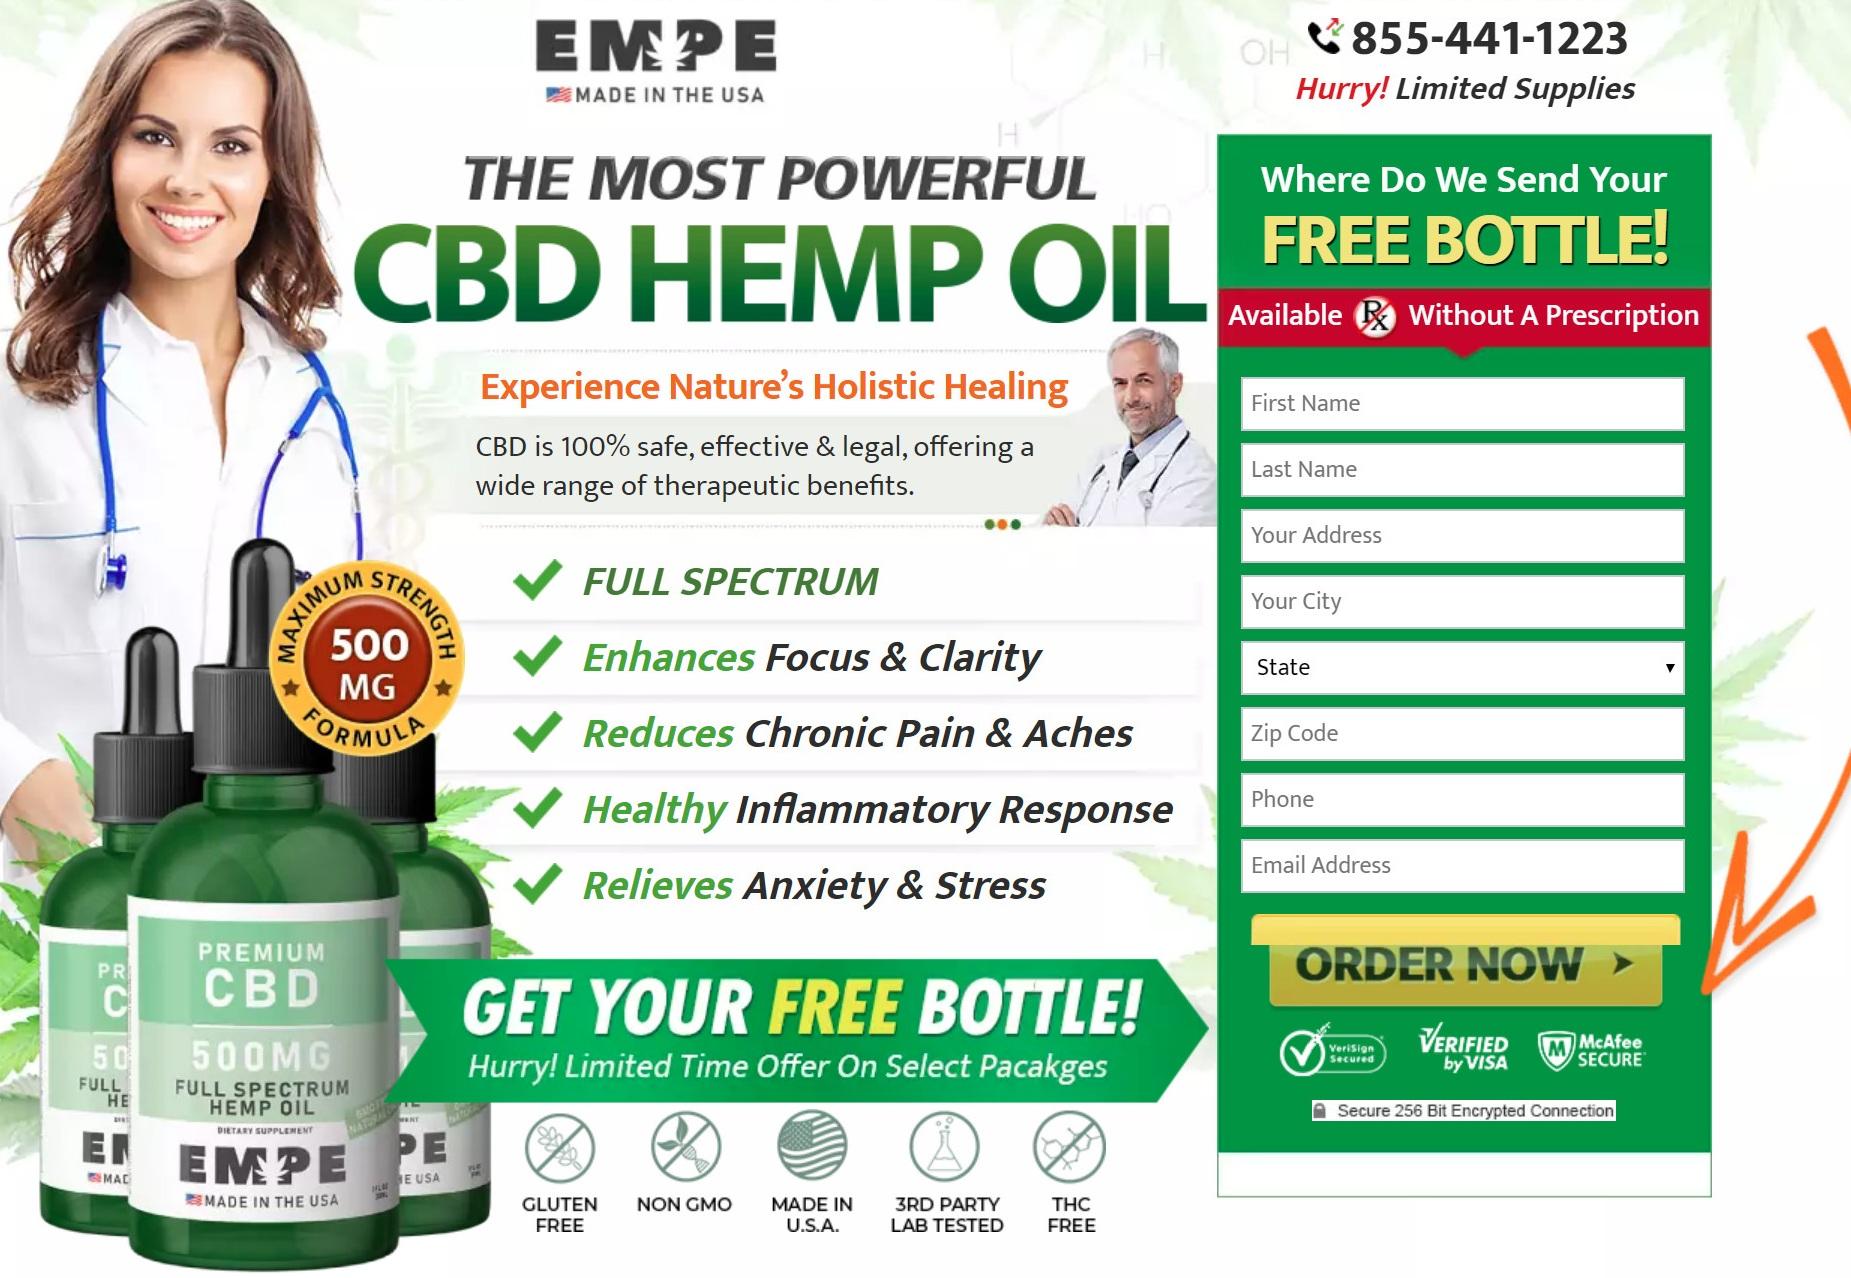 EMPE CBD Oil